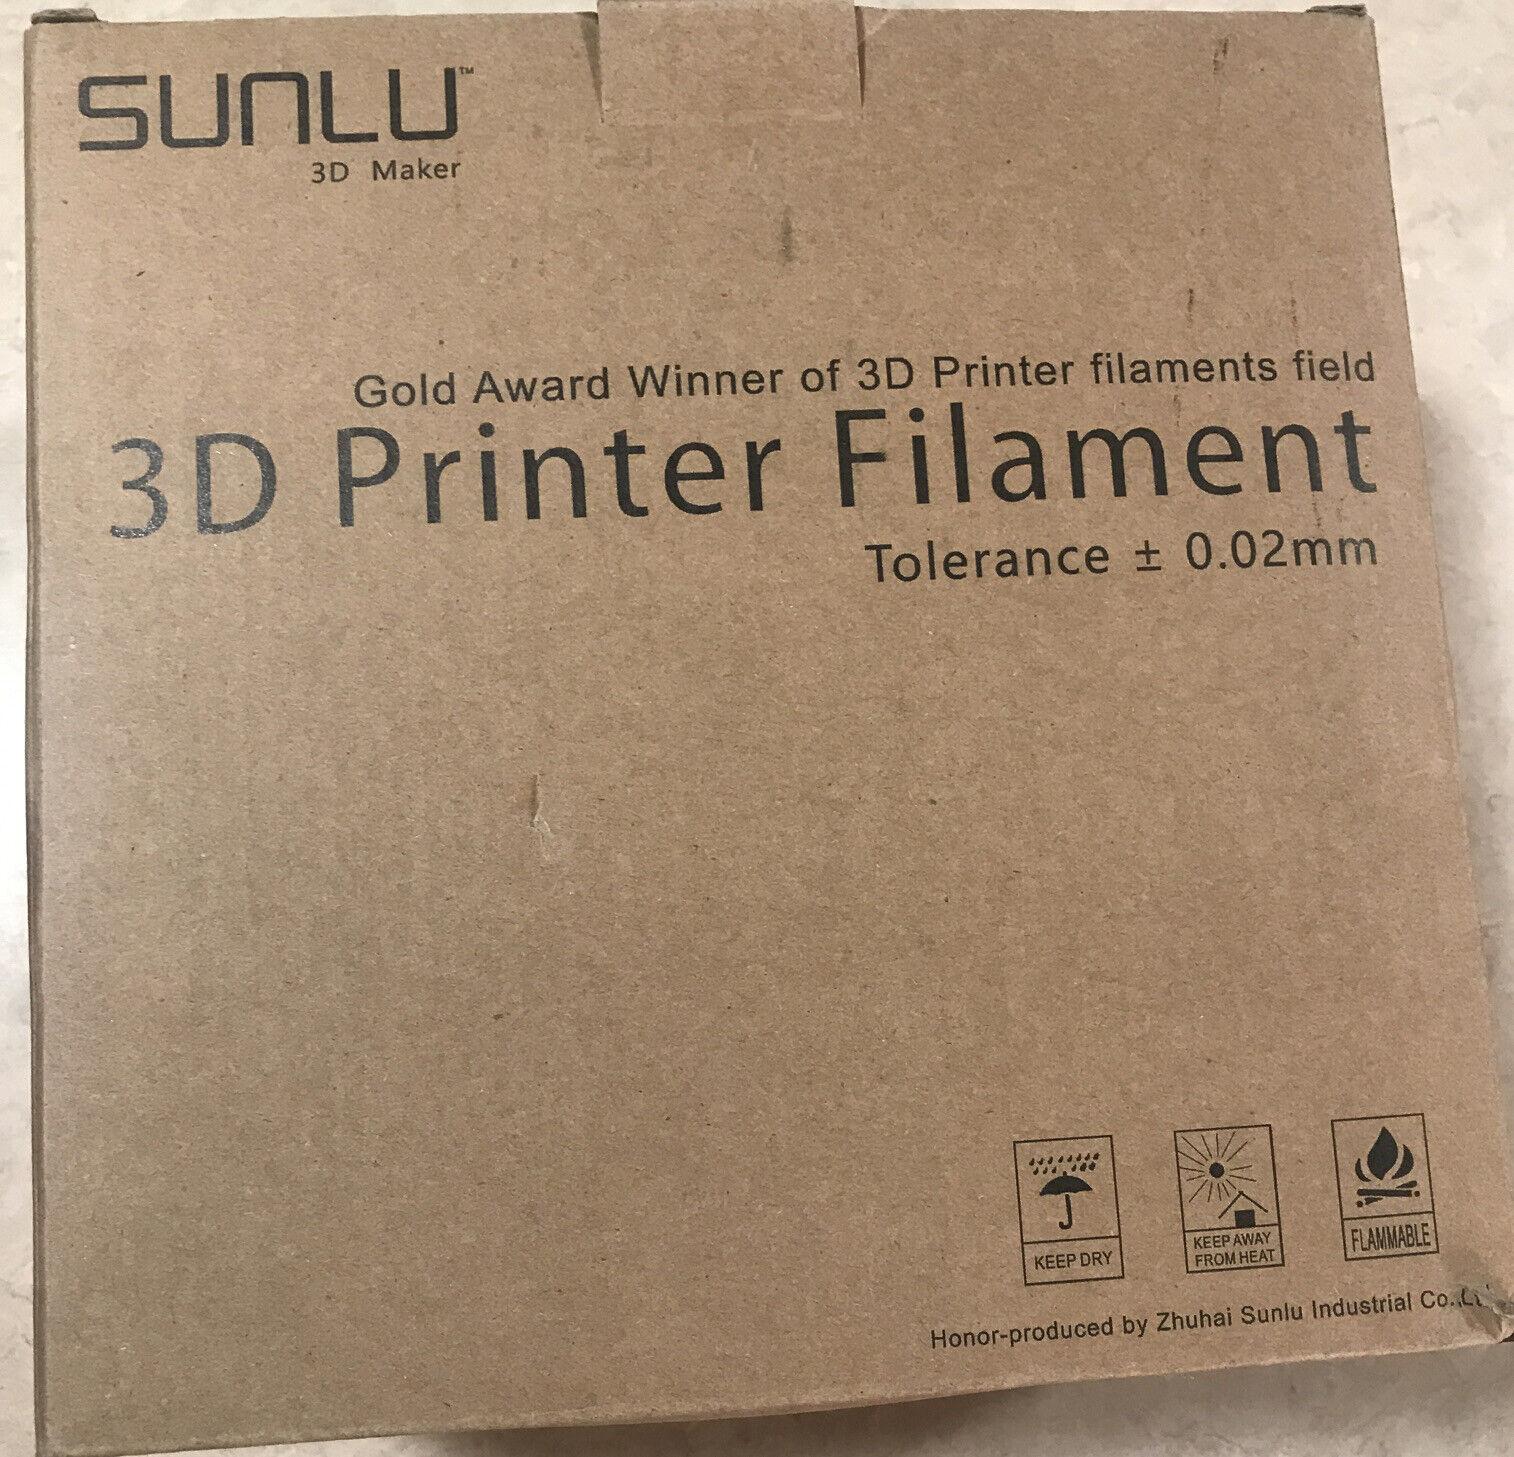 Sunlu 3D Maker 3D Printer Filament 1.75 MM 2 Pack Tolerance 0.02 MM New! V